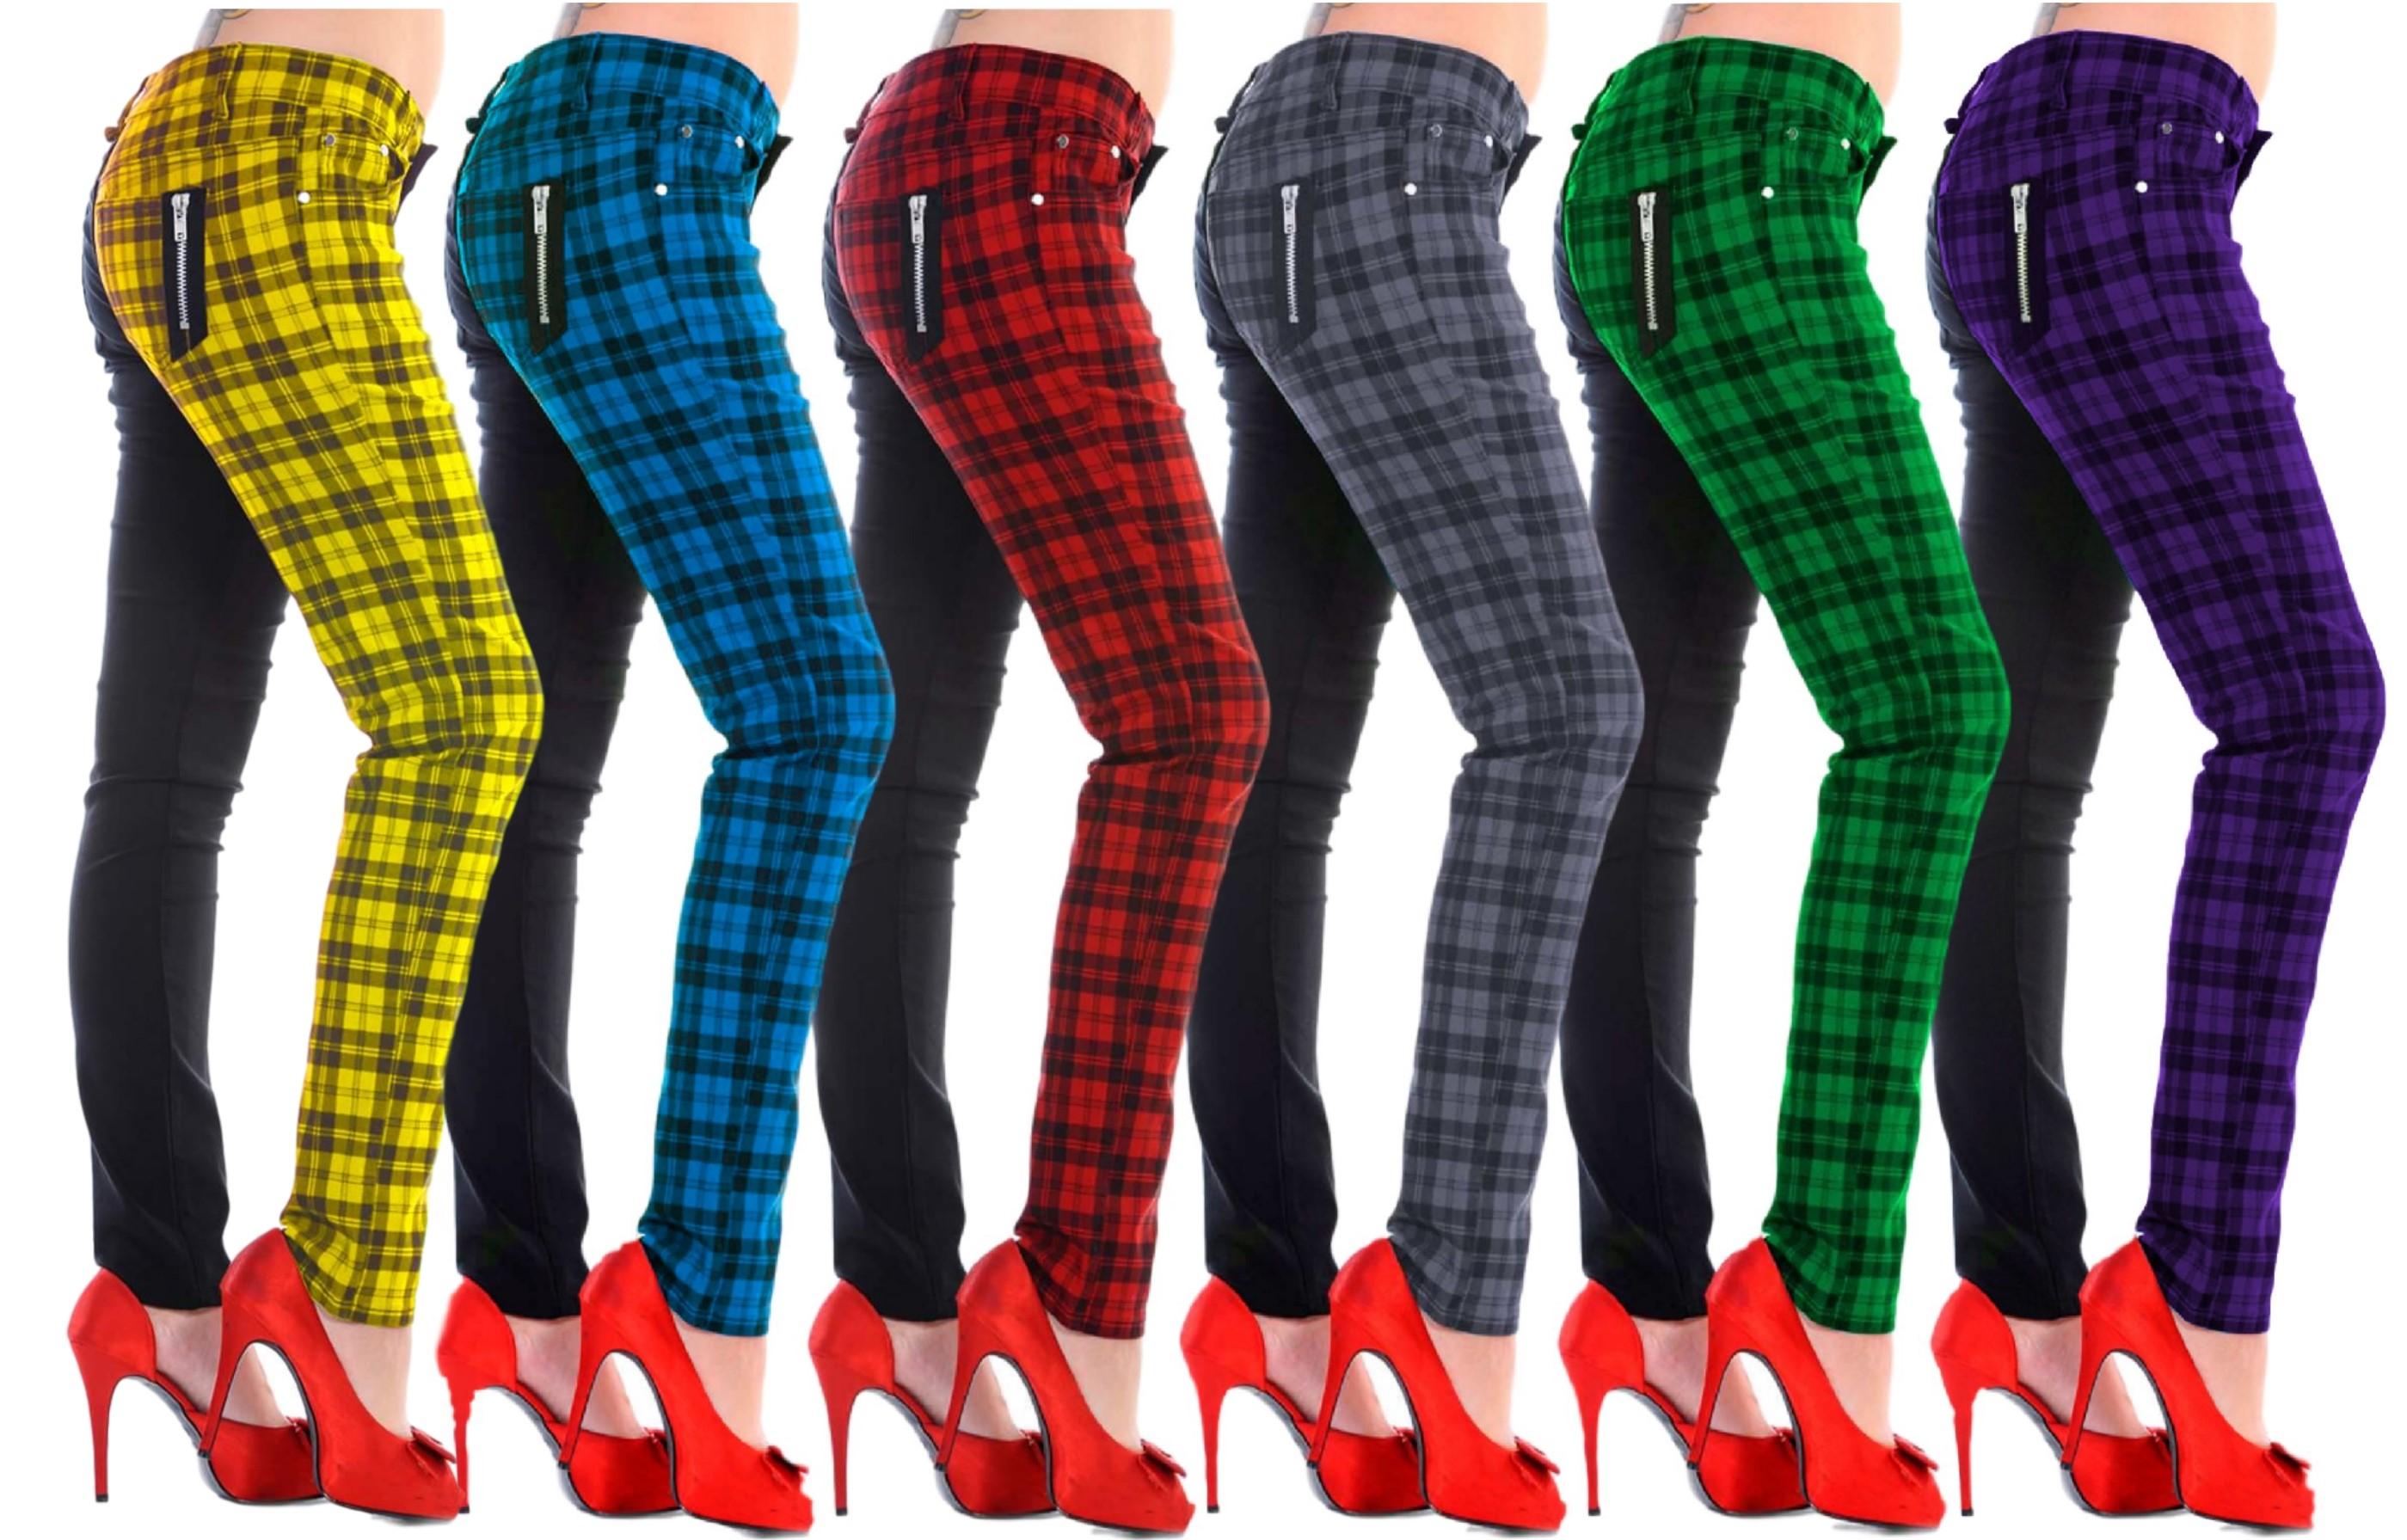 Blue Tartan Check Black Split Legs Skinny Punk Stretch Trousers Banned Apparel